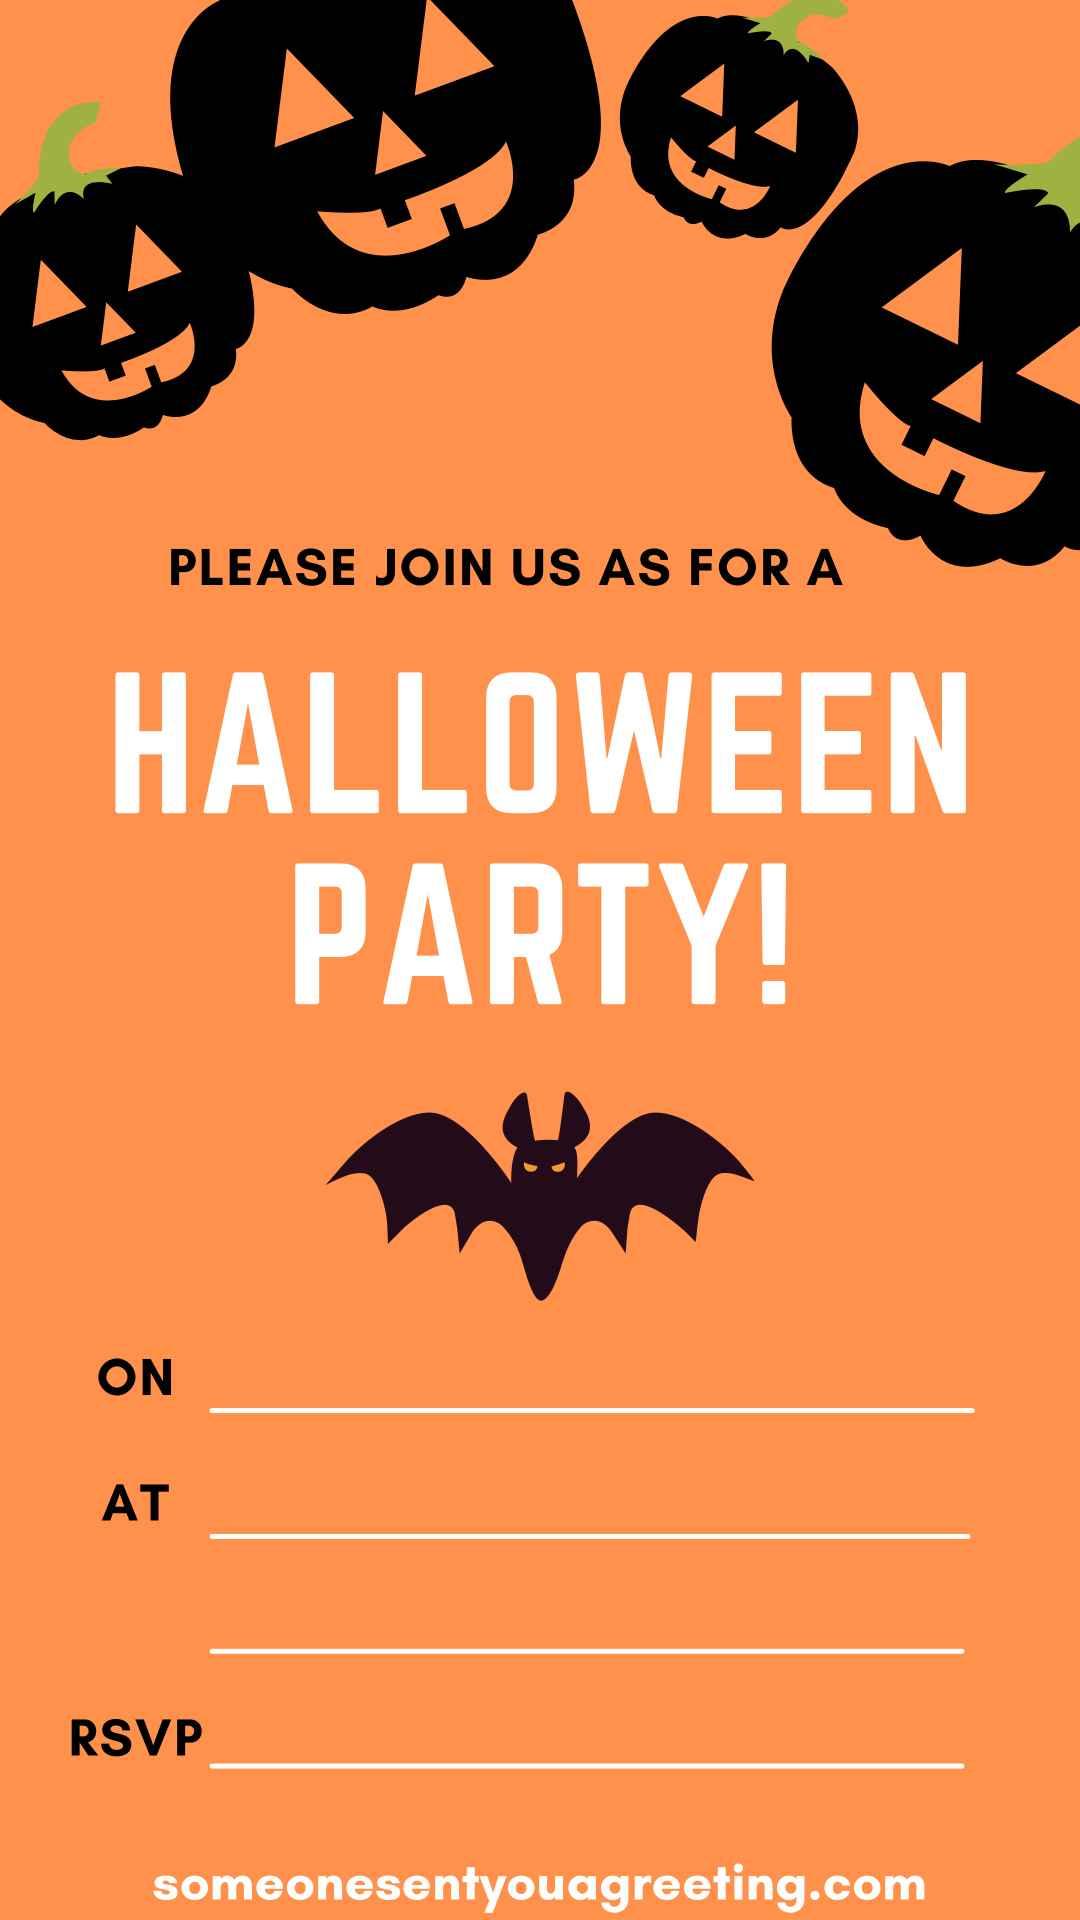 Halloween Party Invitation wording example